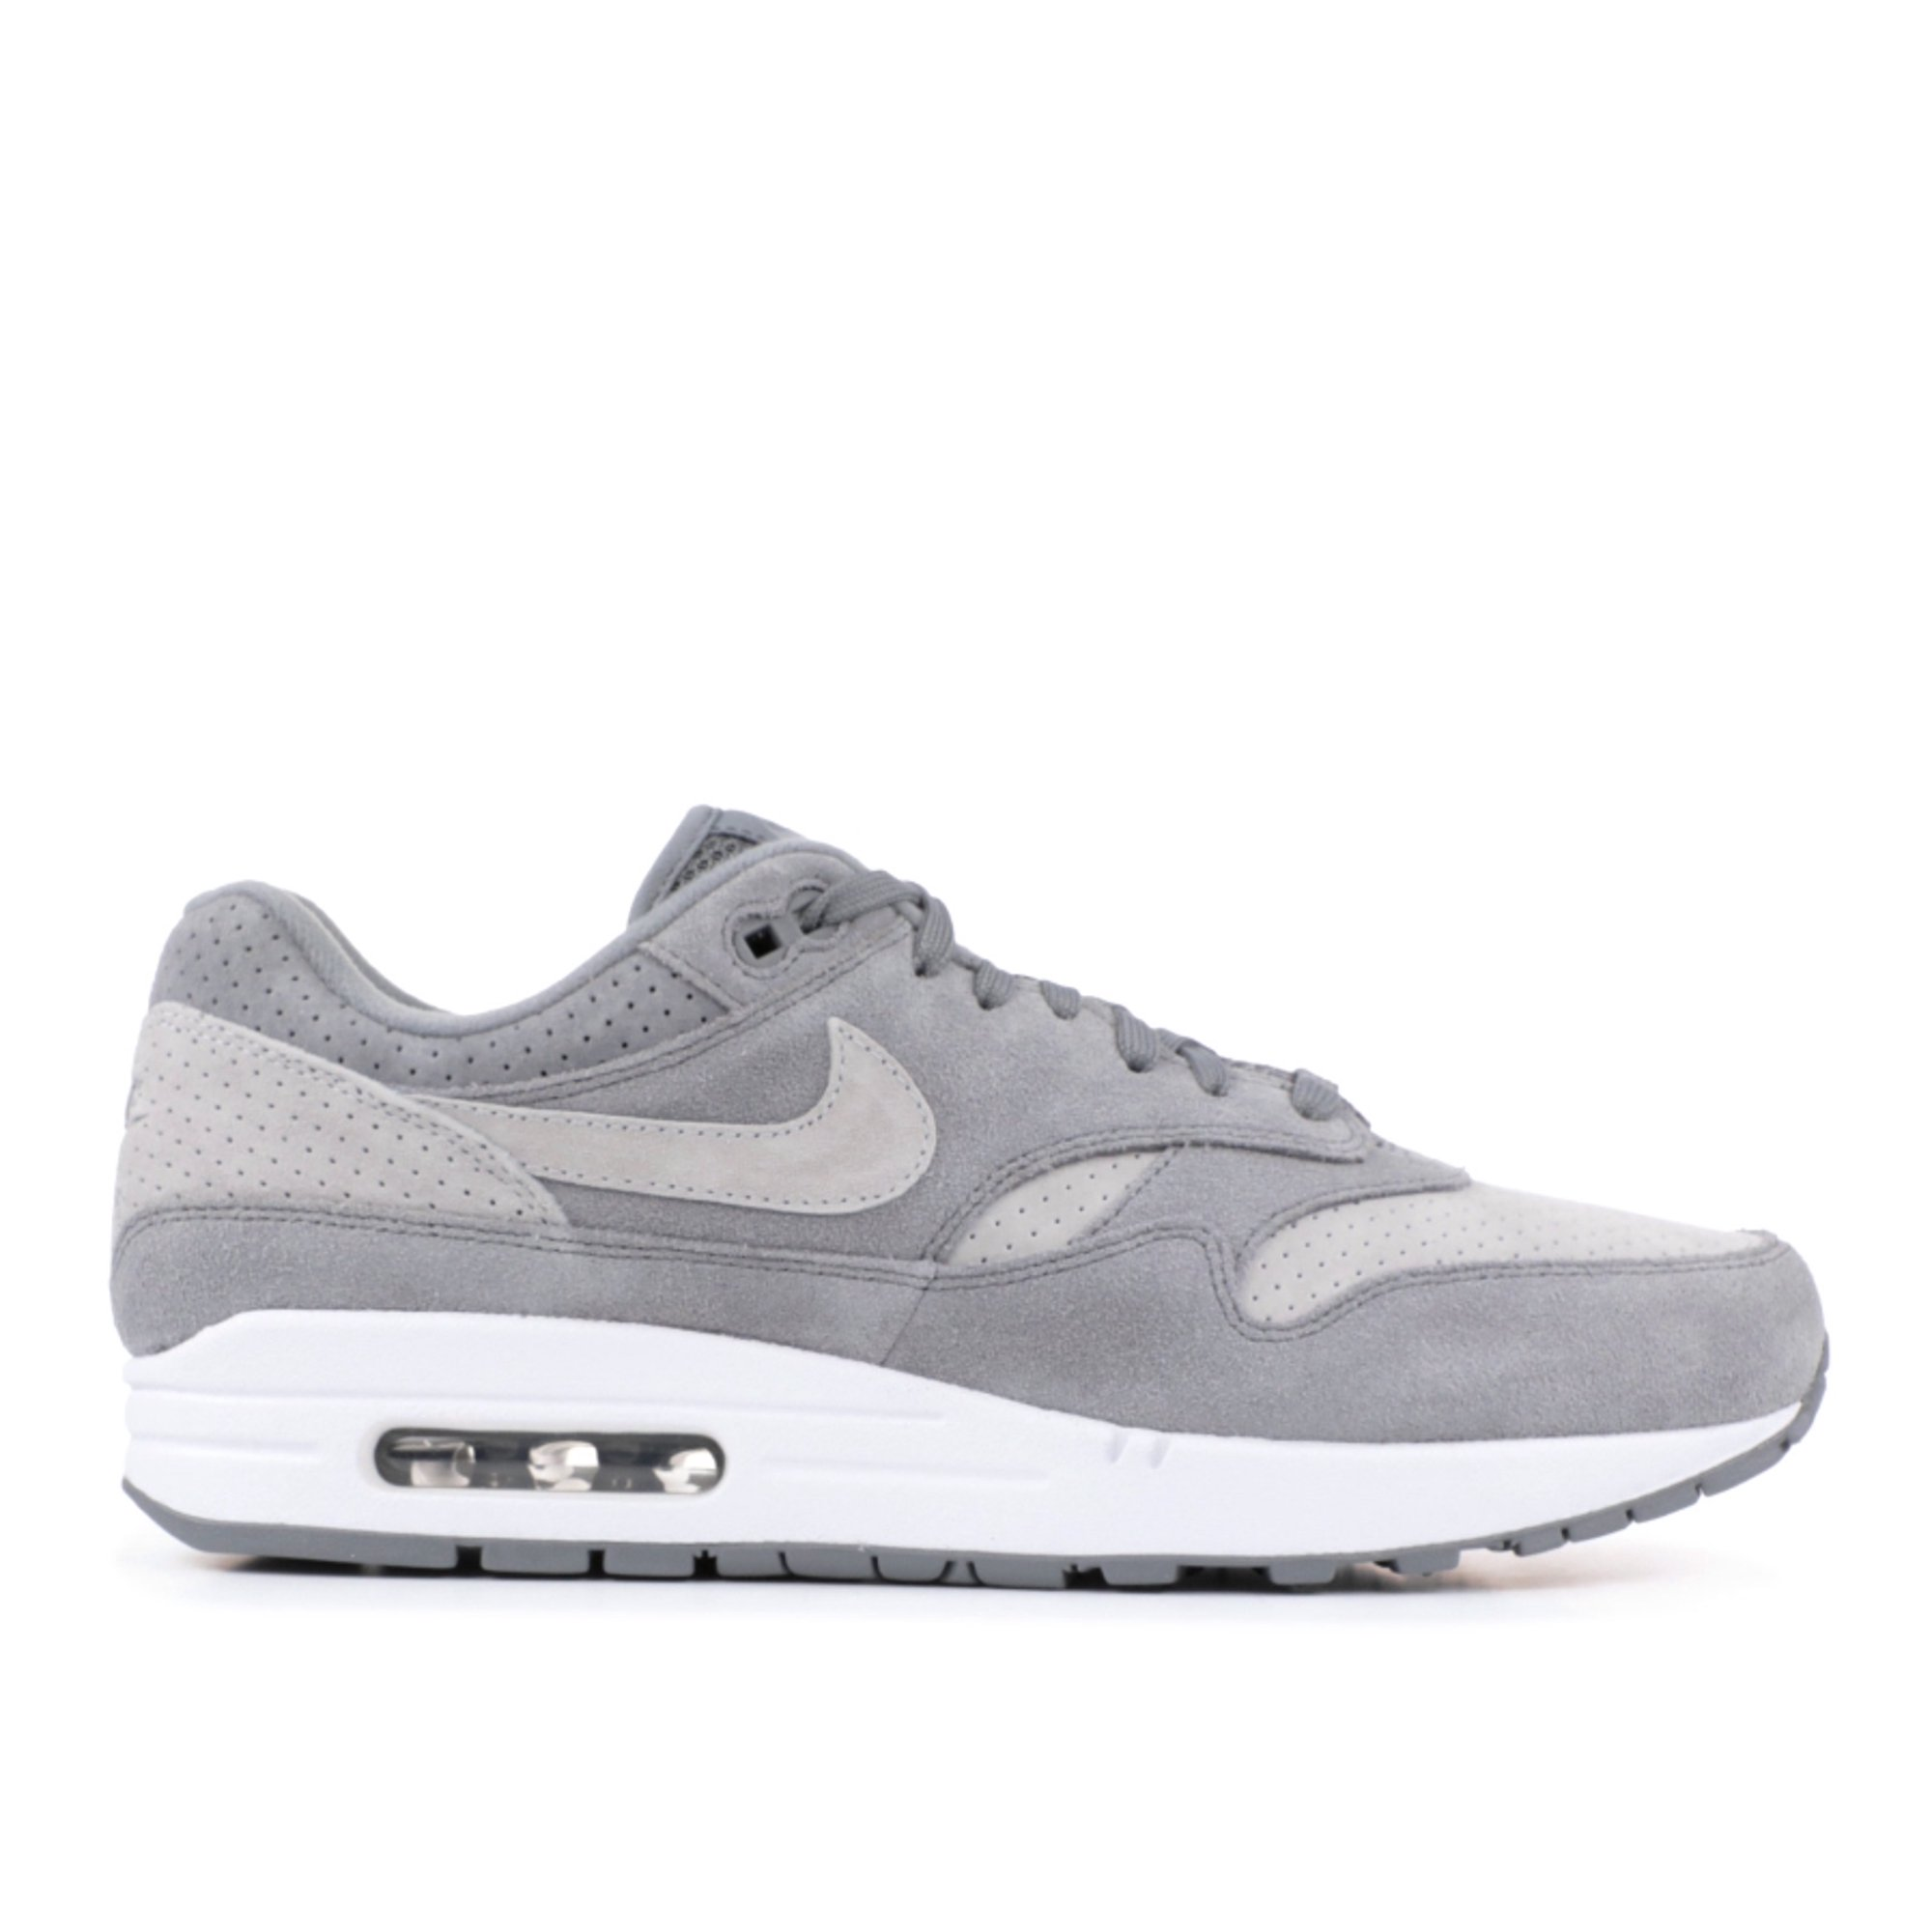 the best attitude 10353 38f66 Nike - Men - Nike Air Max 1 Premium - 875844-005 - Size 8.5   Walmart Canada